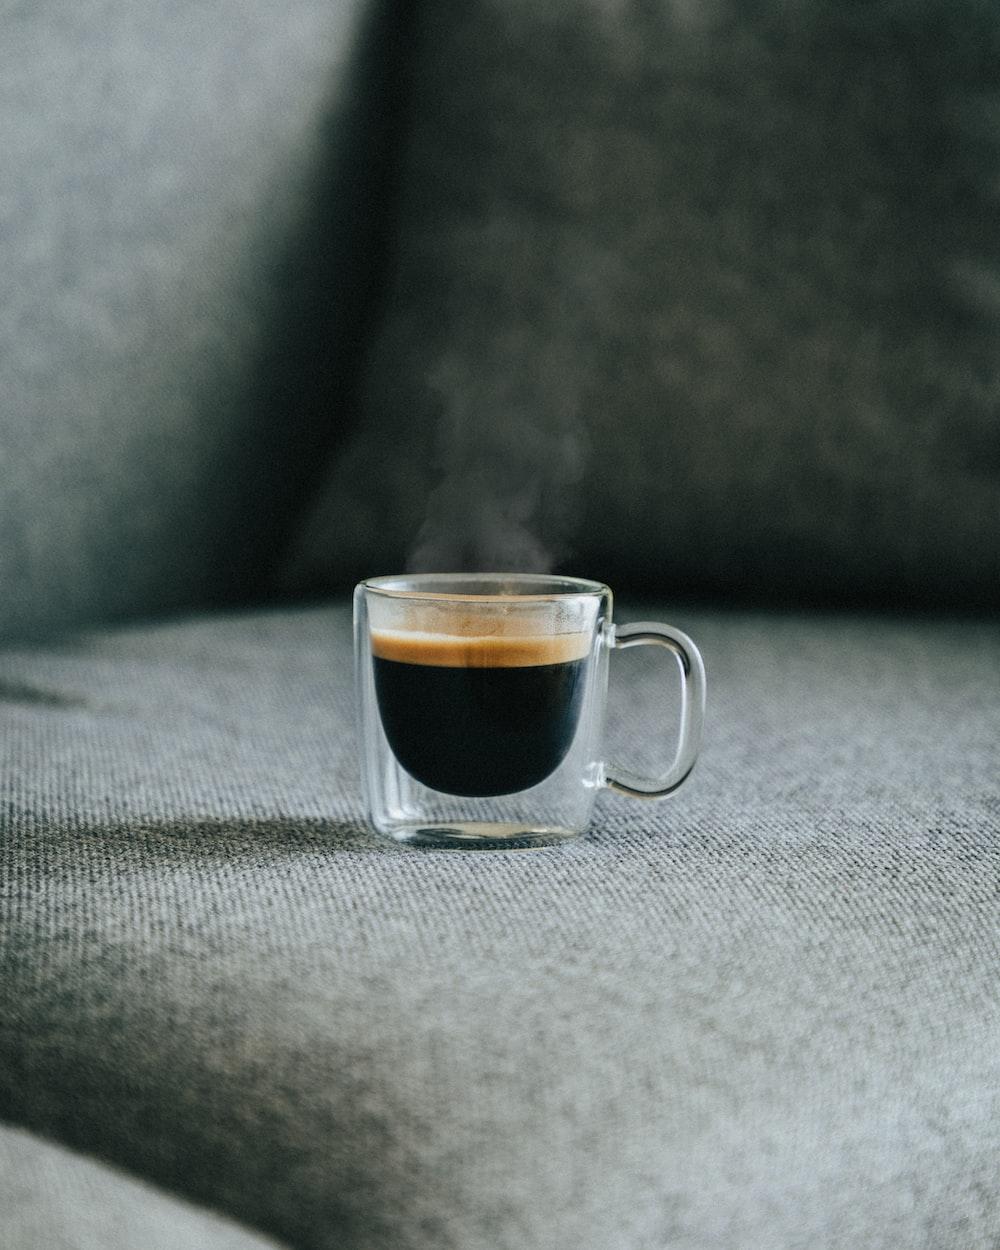 clear glass mug with brown liquid